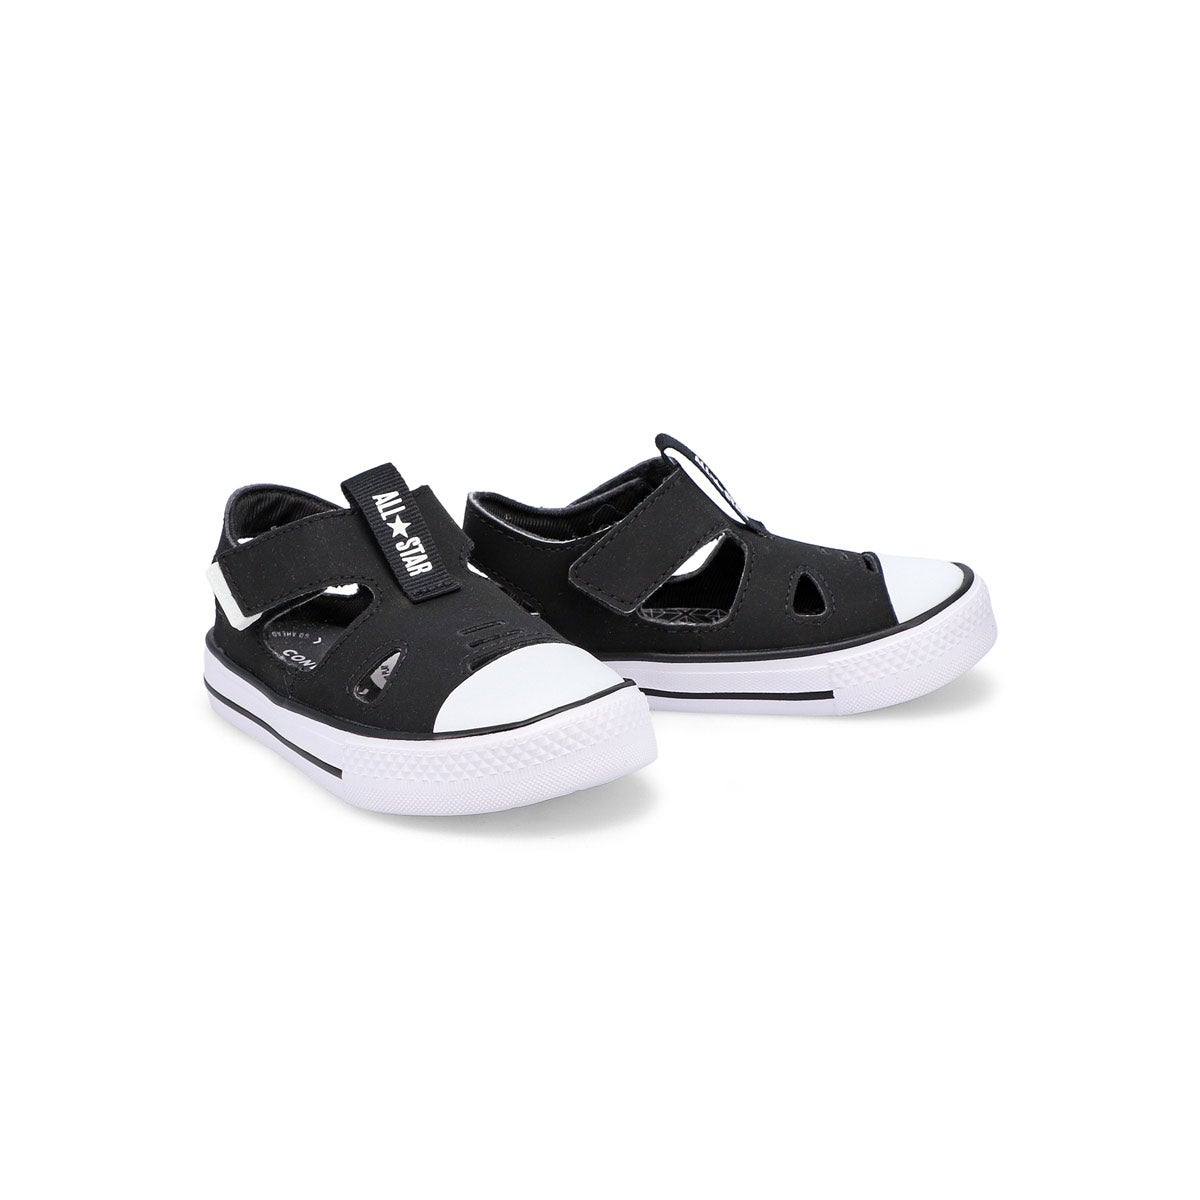 Infants' All Star Superplay Sandal - Black